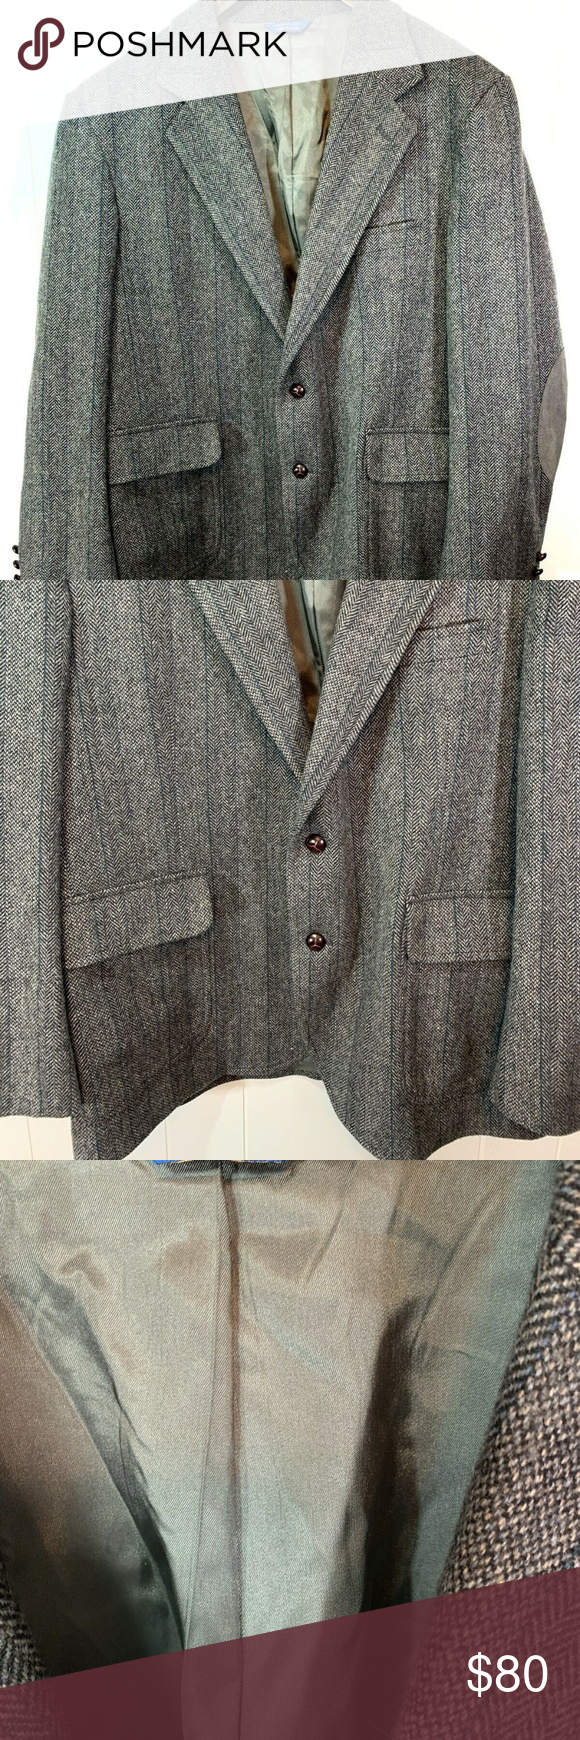 Vintage Pendleton Wool Western Sport Coat Size 48